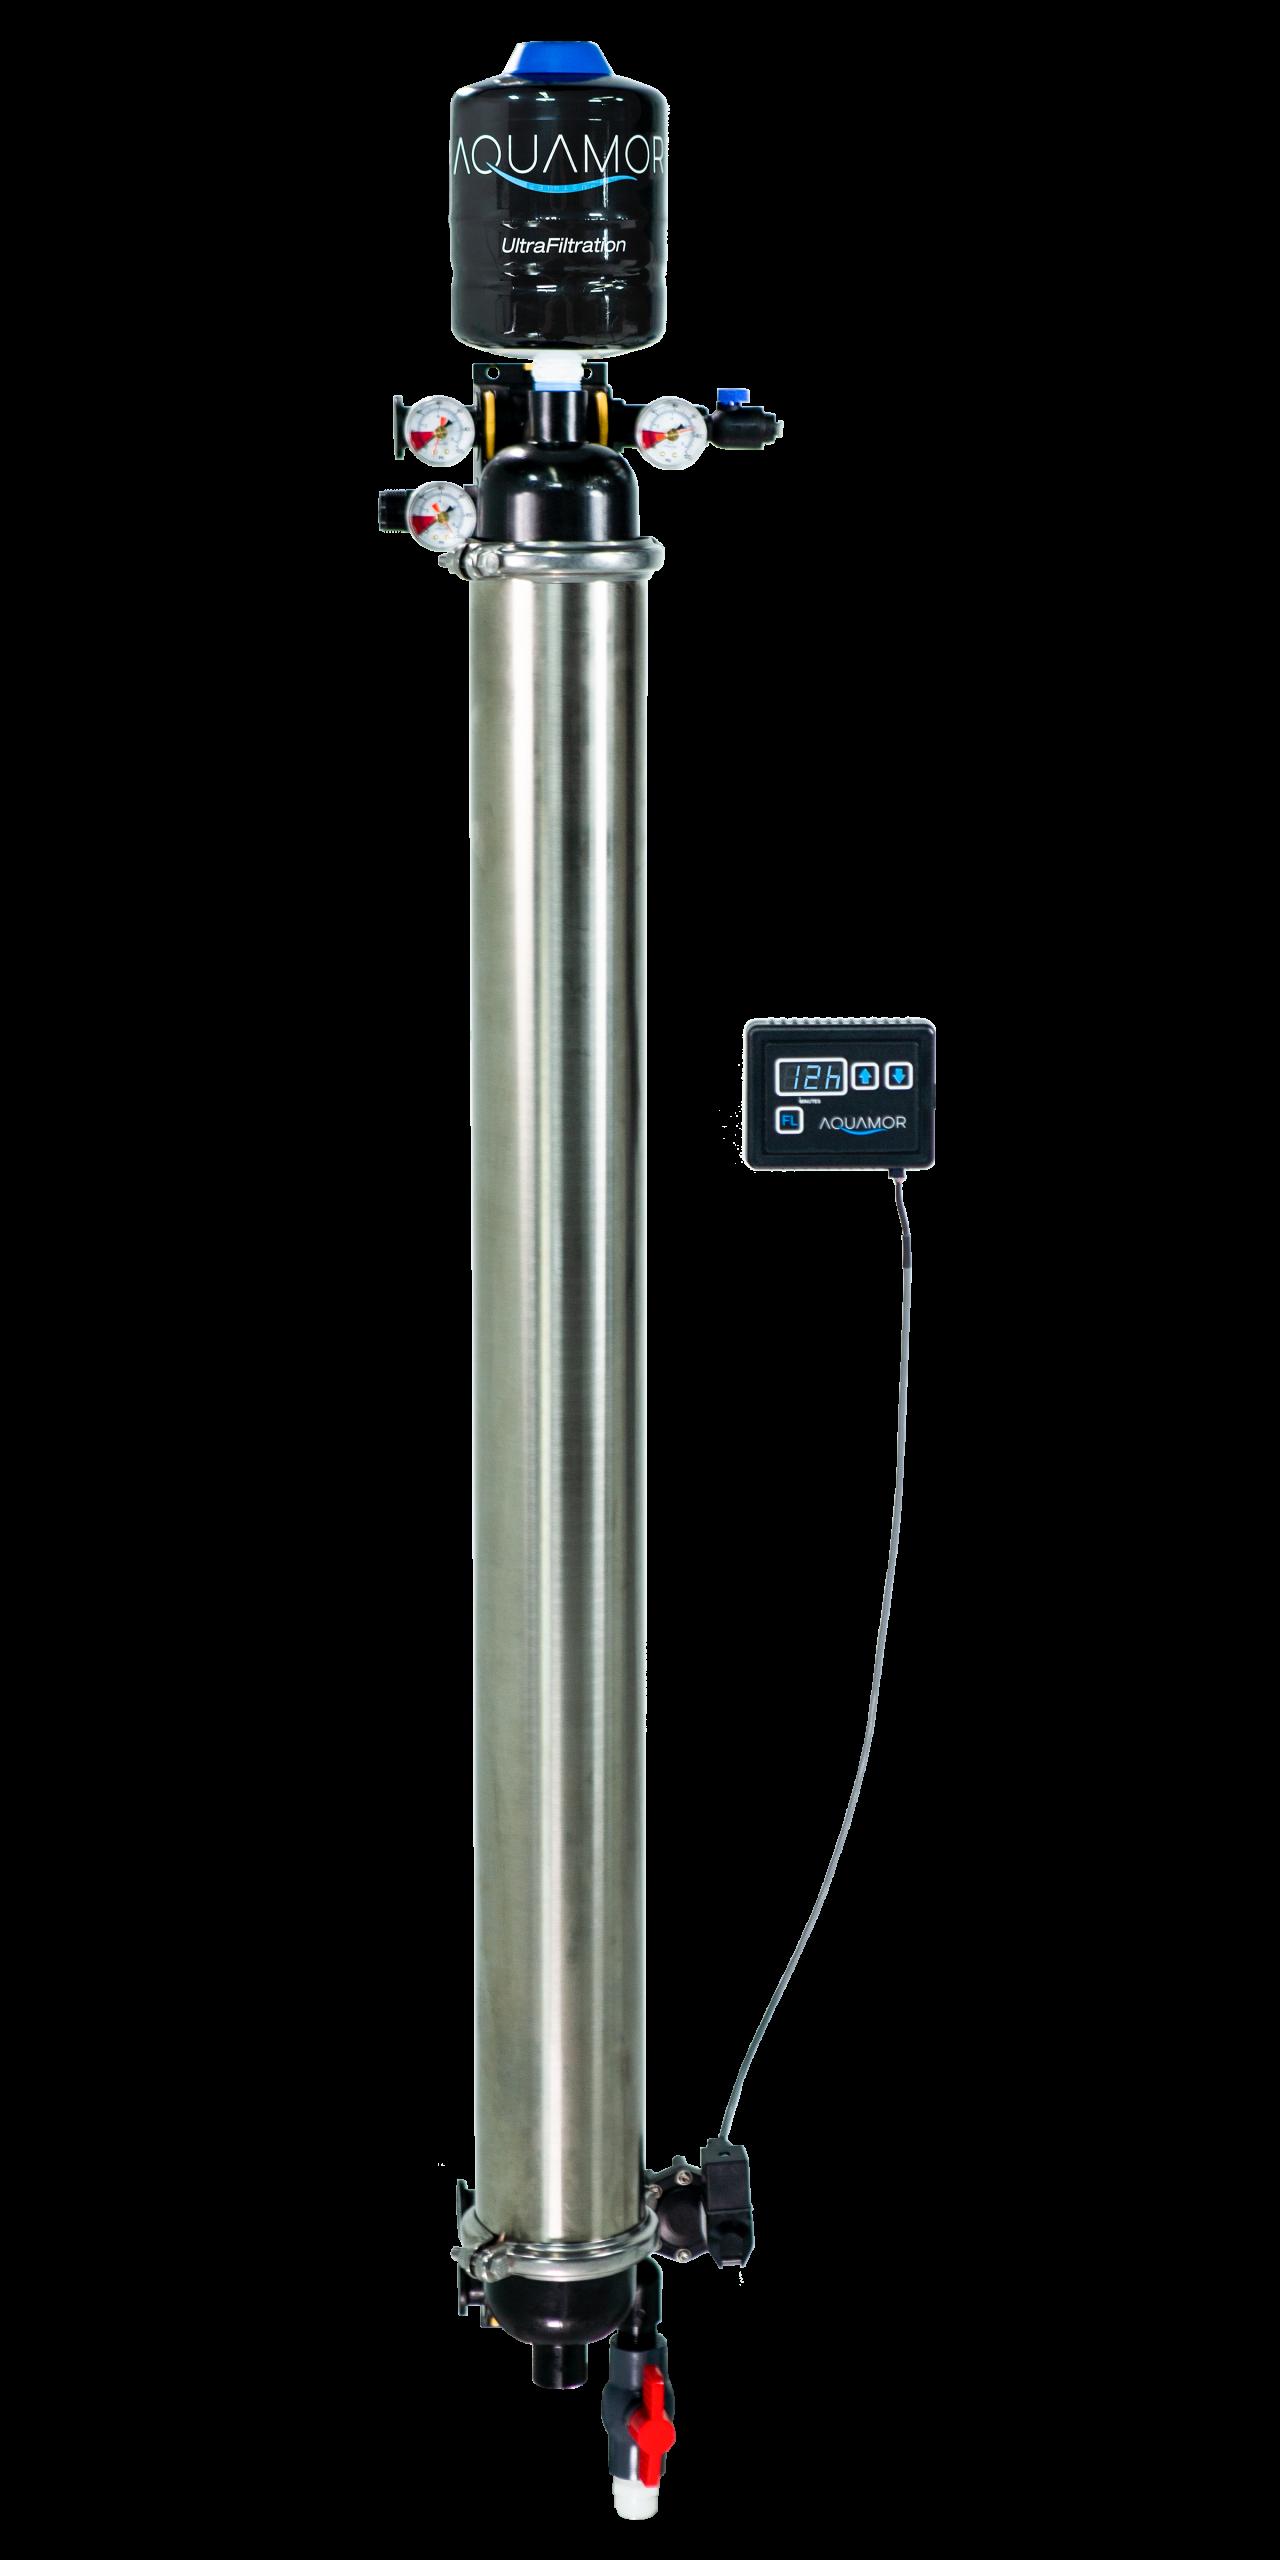 Diamond Ultra Filter Image